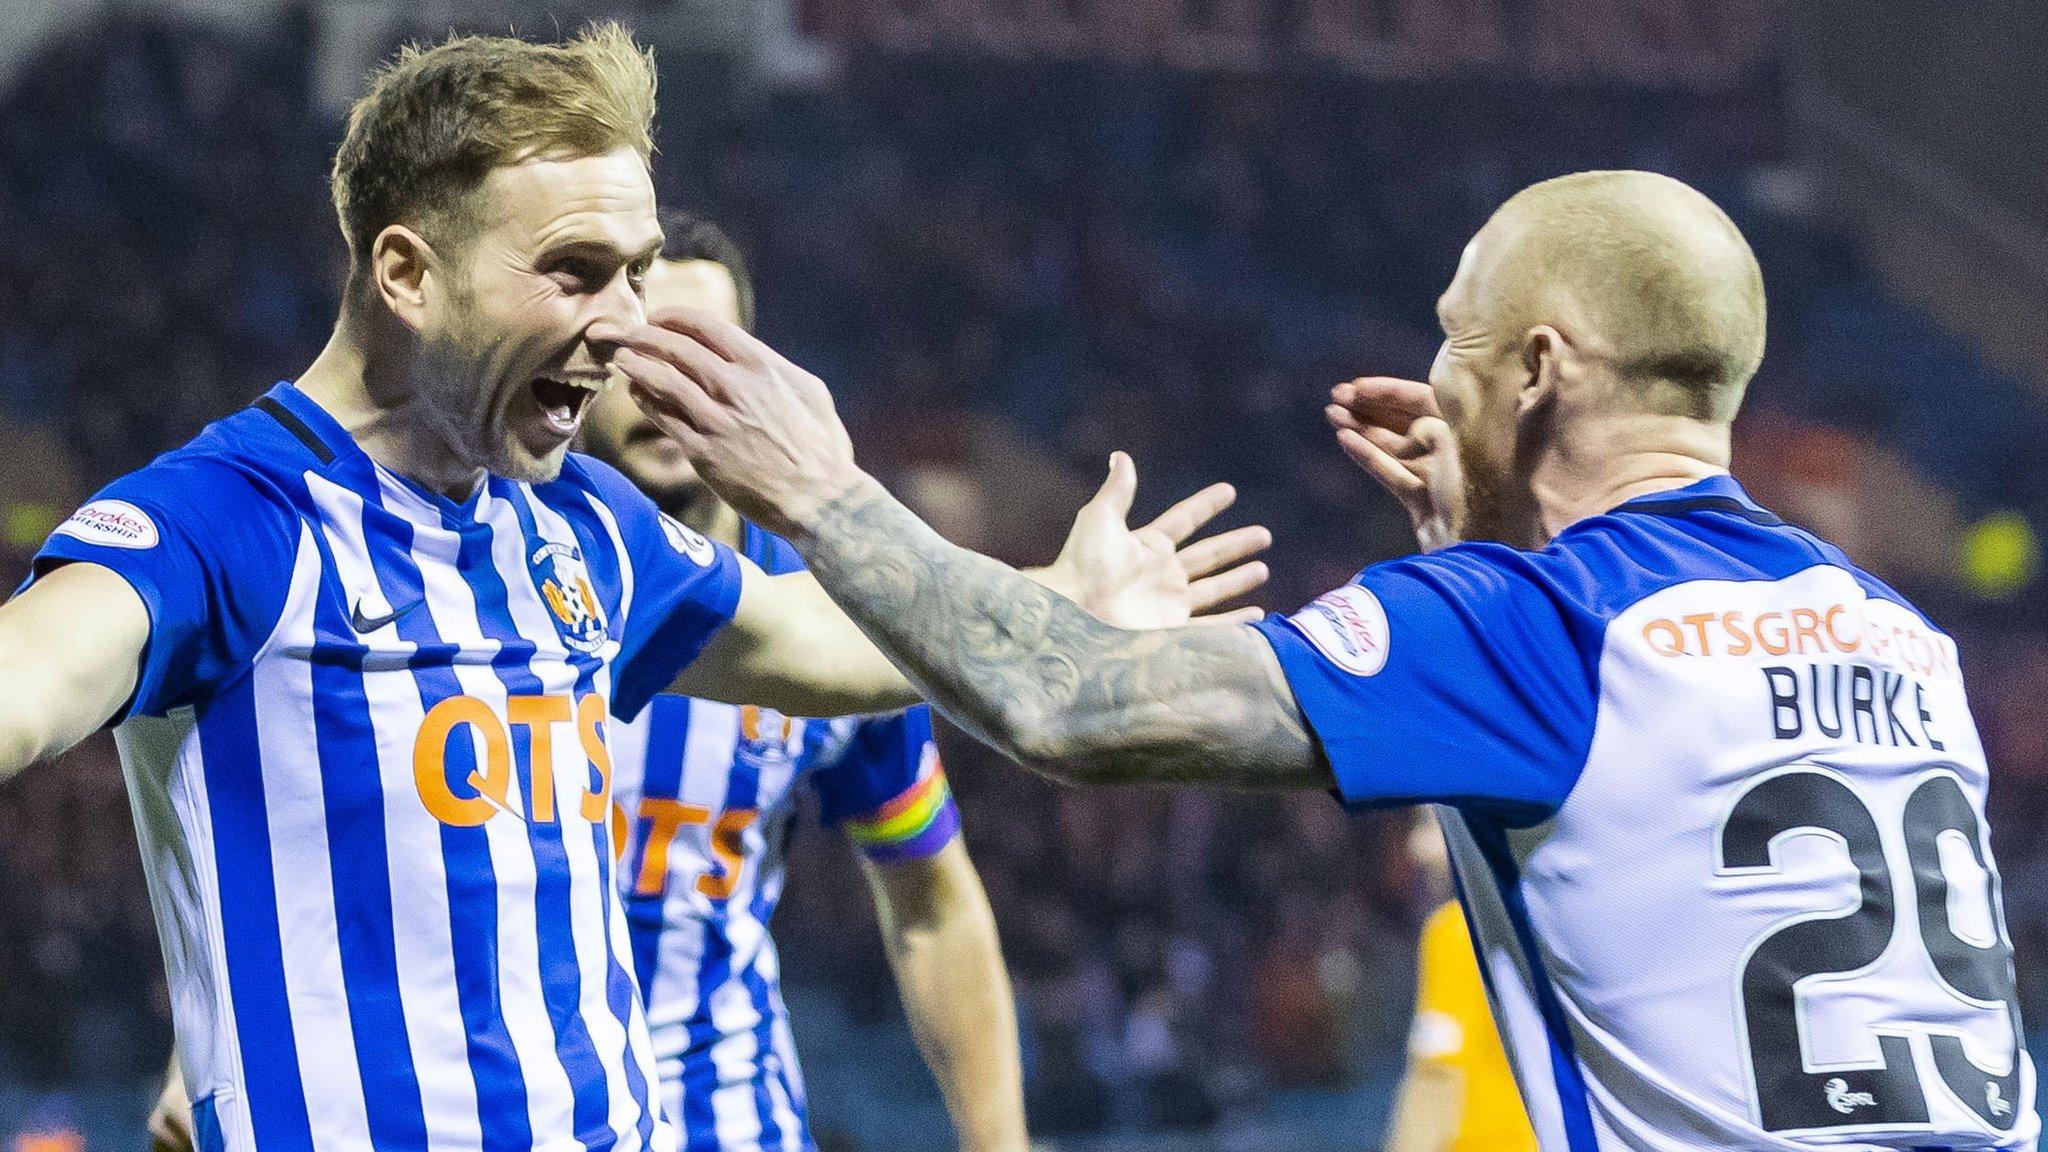 Kilmarnock 2-0 Livingston: Greg Stewart double puts Ayrshire side top